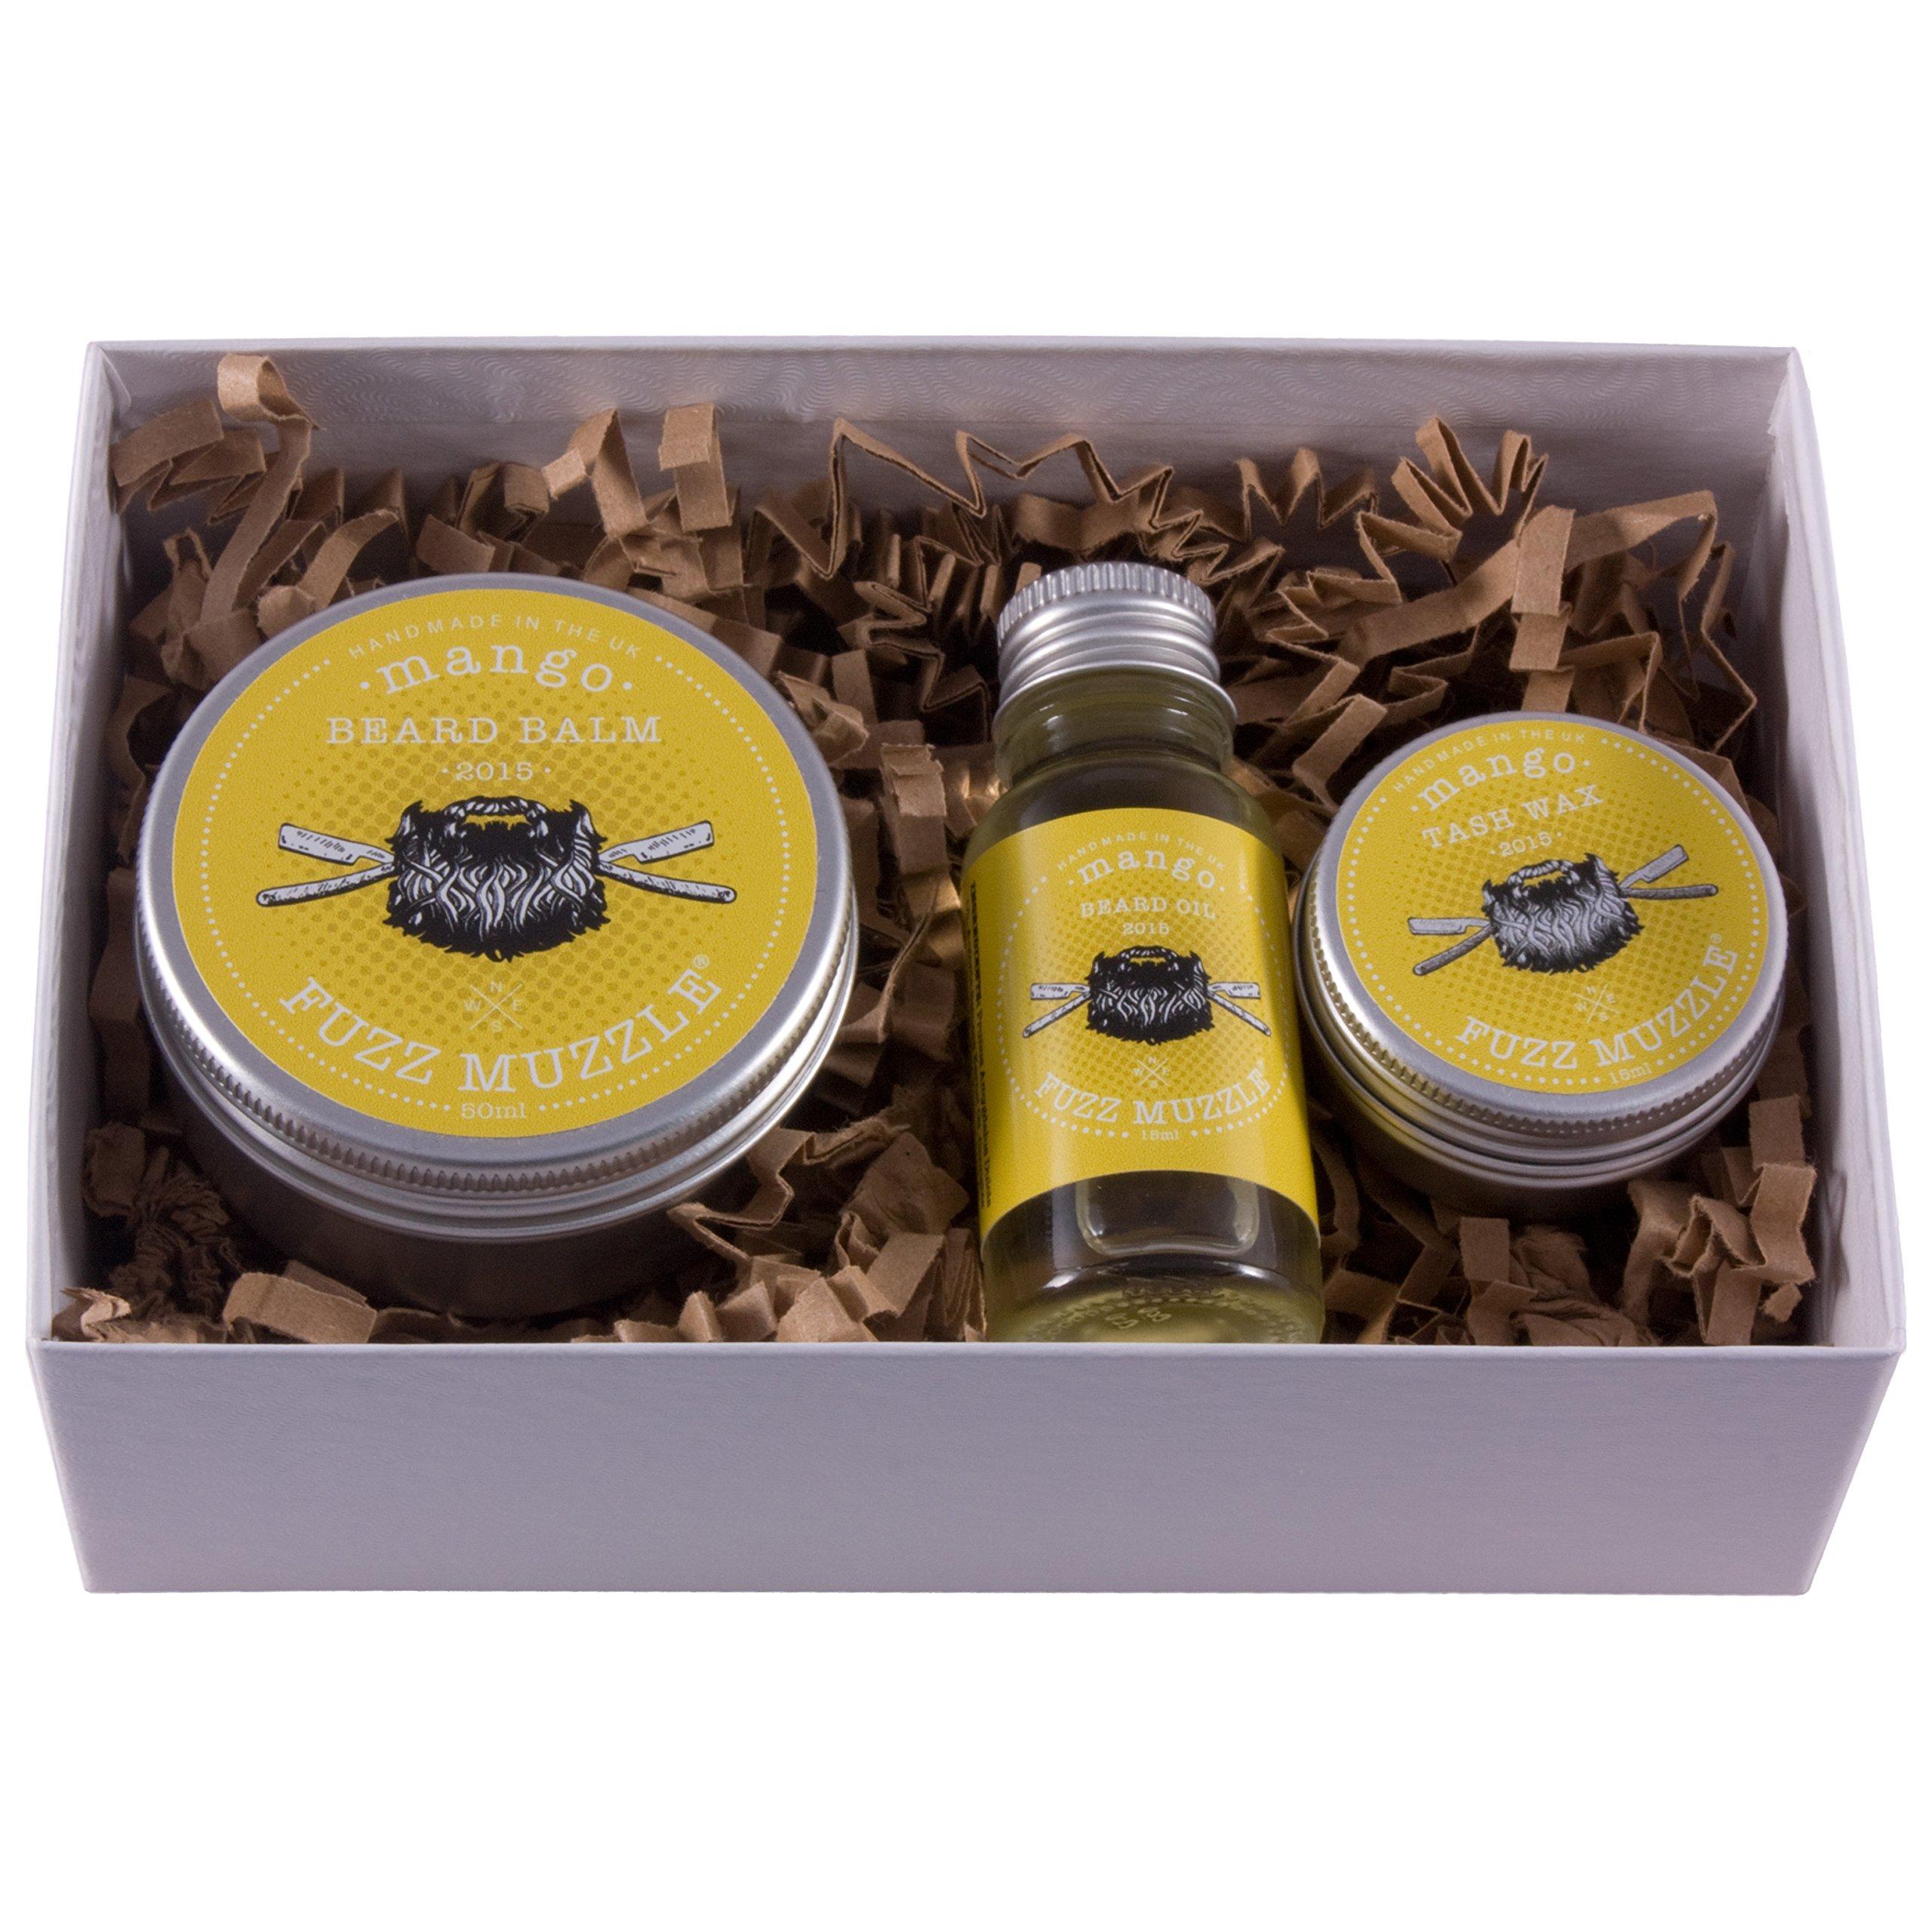 Fuzz Muzzle Mango Beard Balm, Beard Oil & Moustache Wax Gift Set